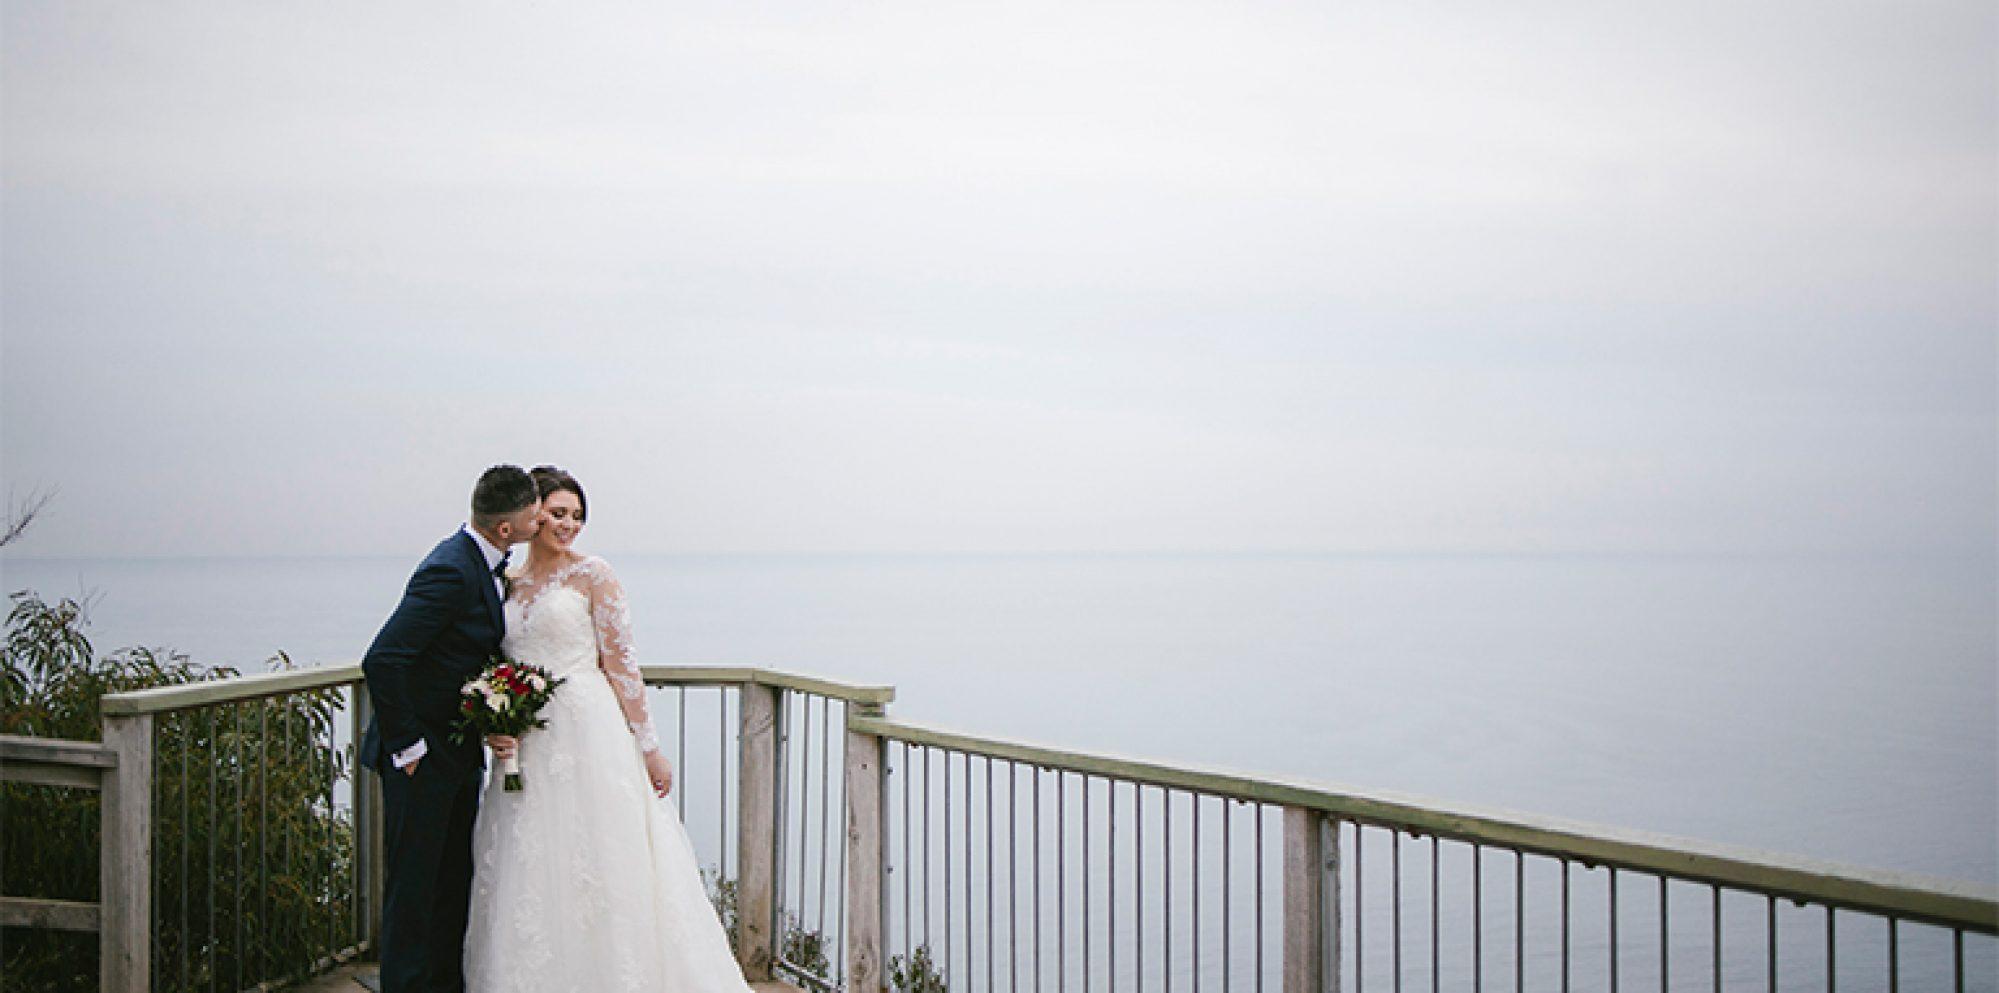 Rebecca & klay wedding photography @ lorne hotel